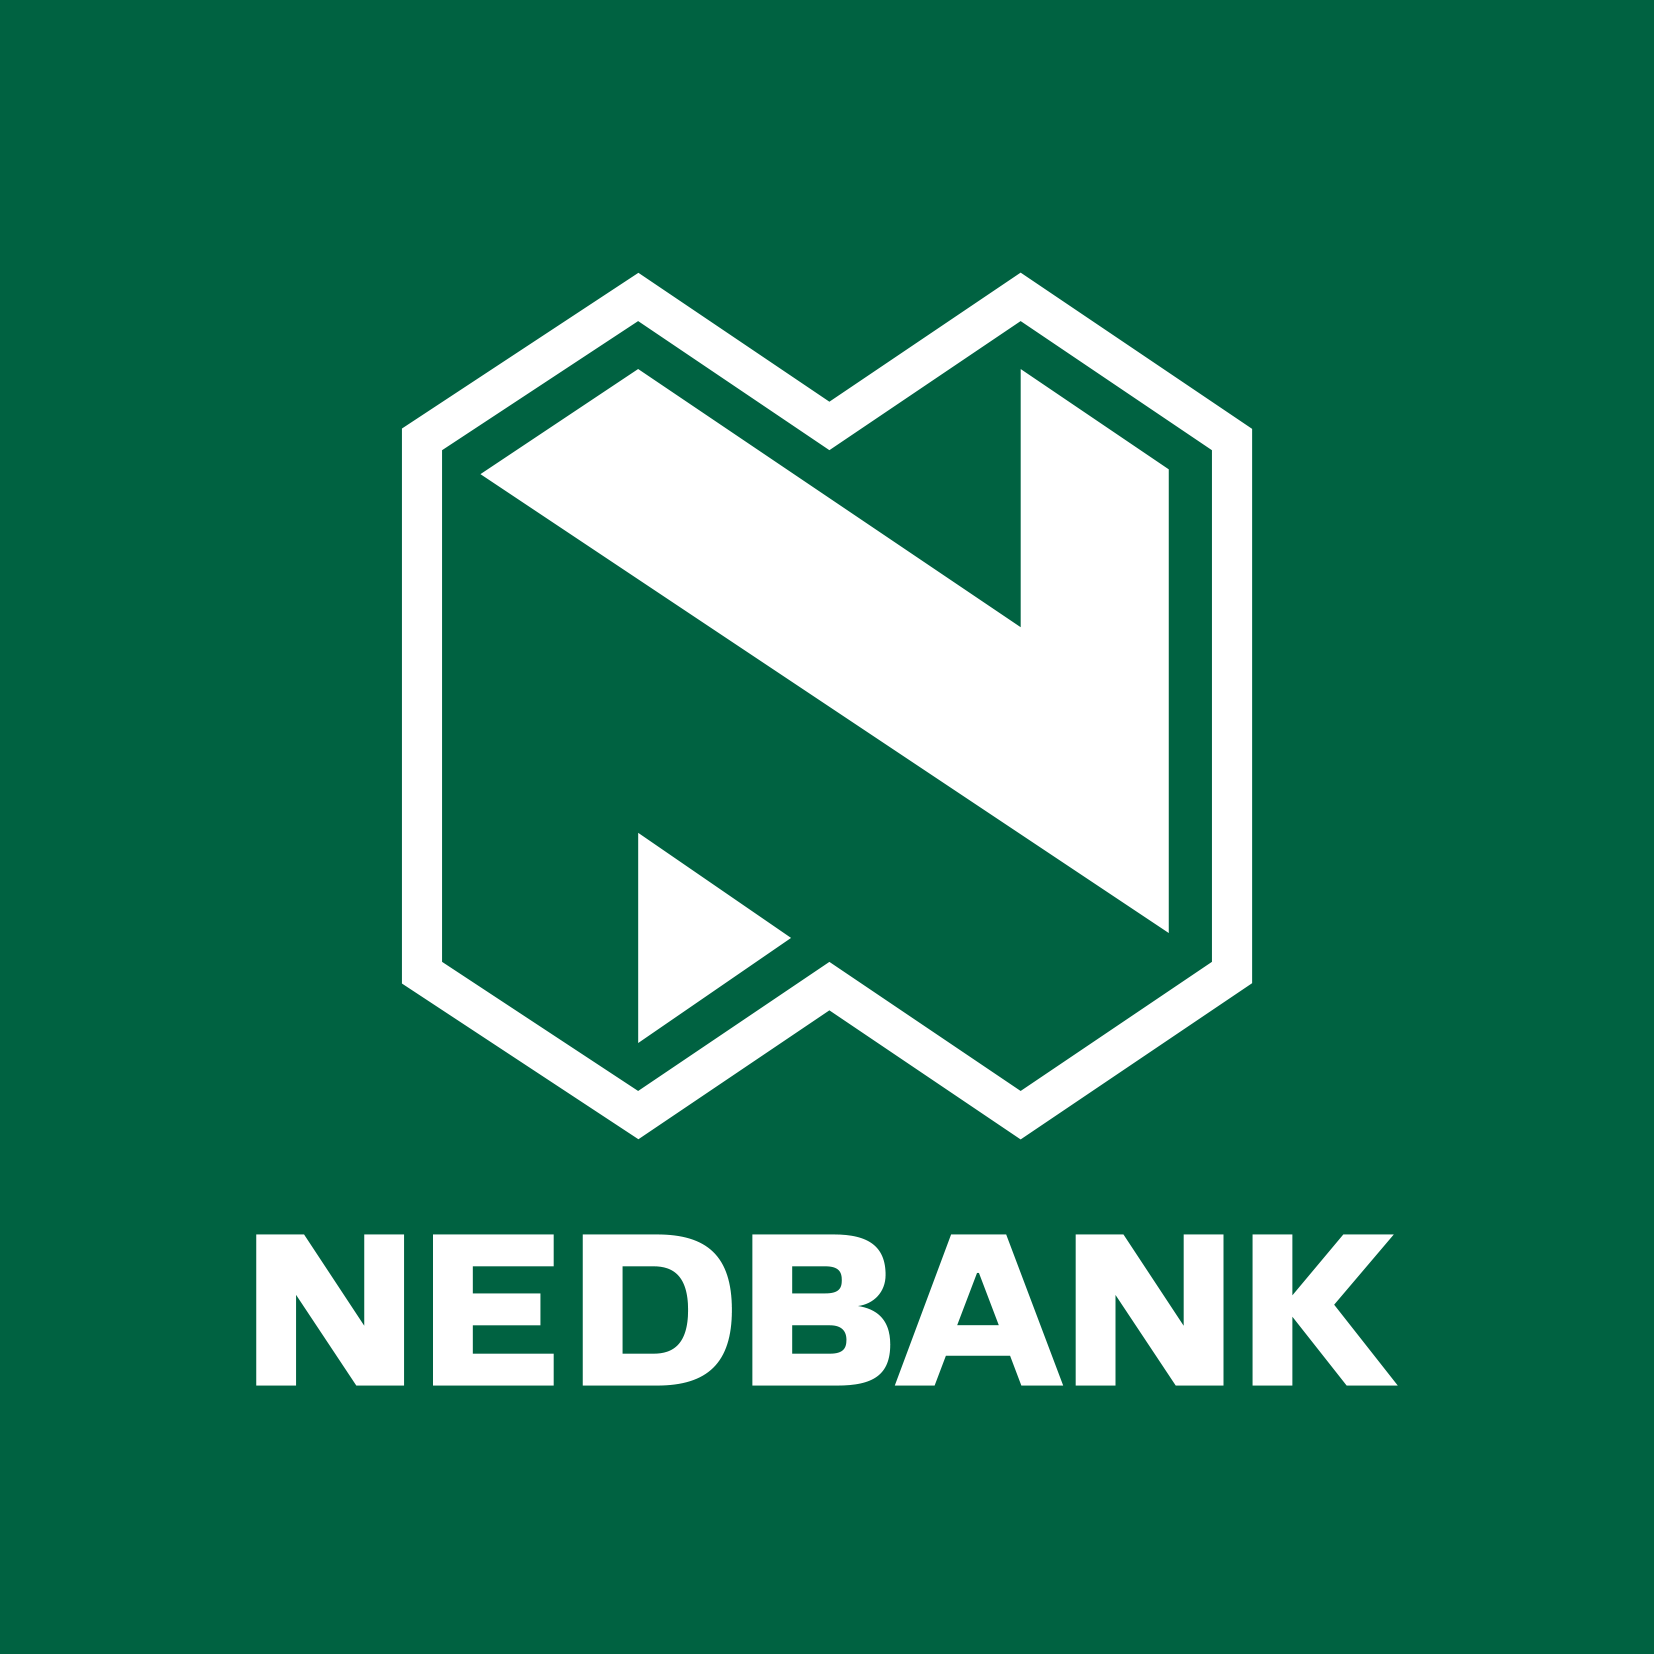 Nedbank Image Library.